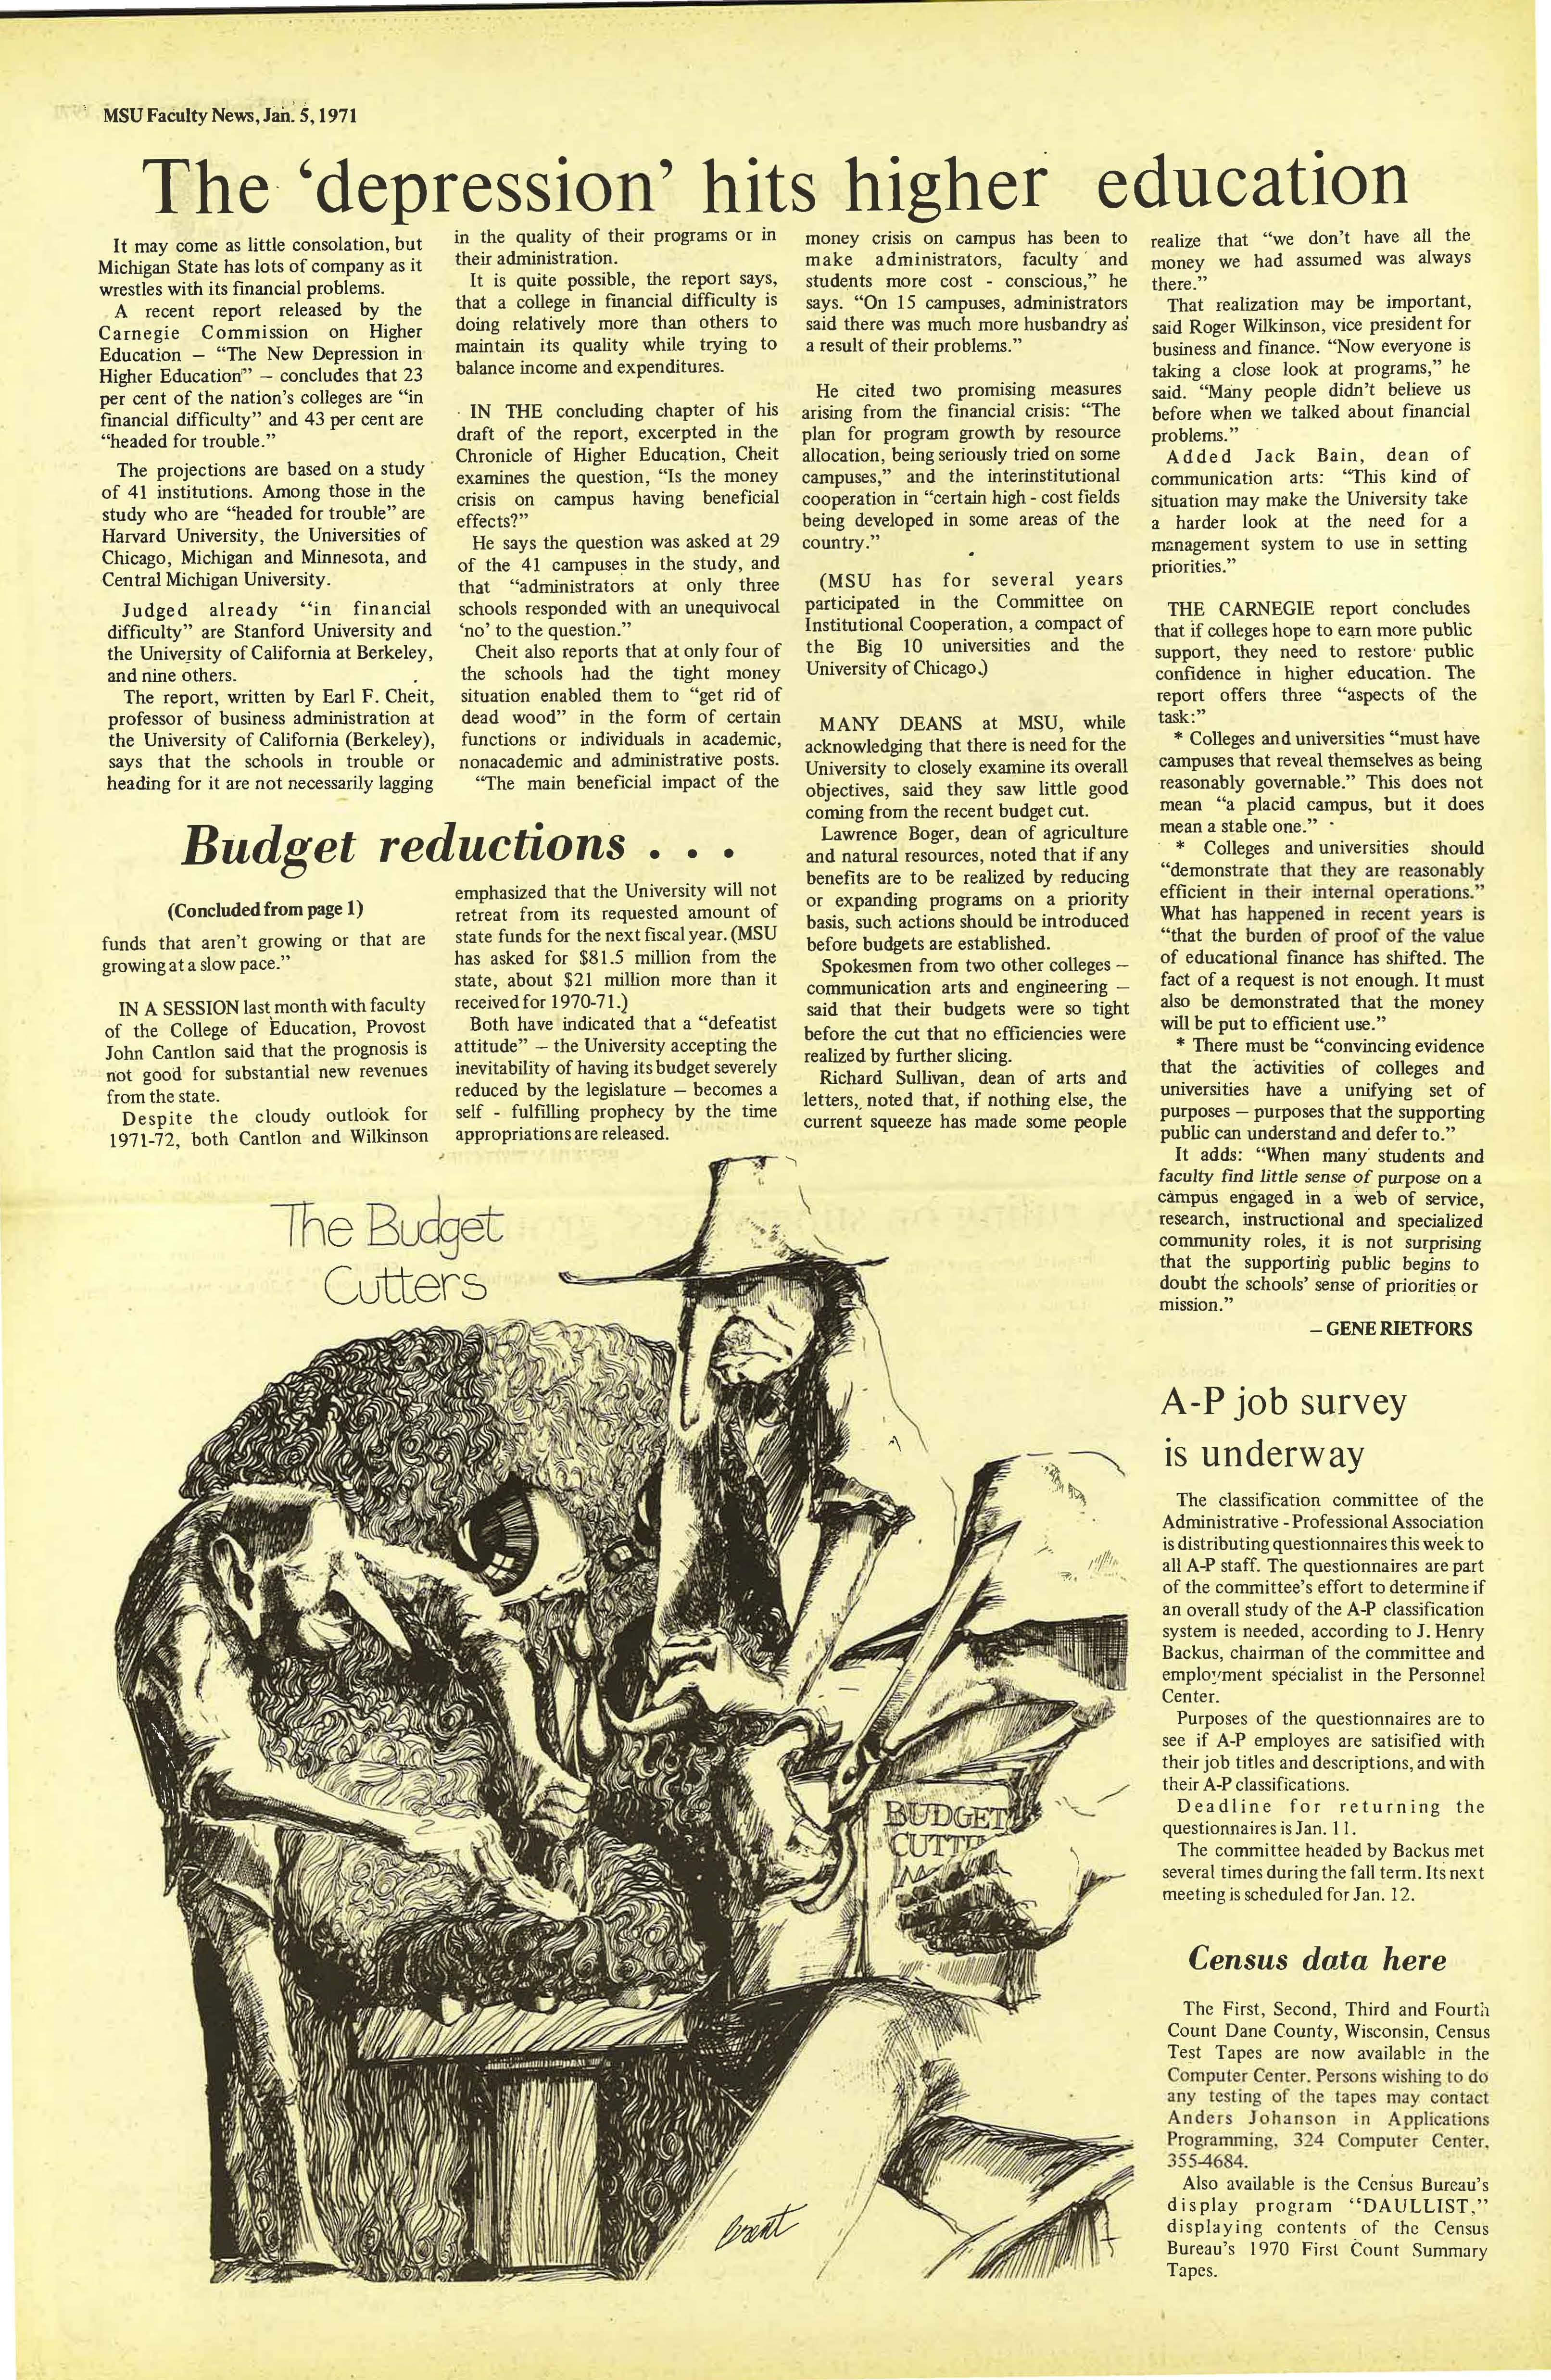 MSU News Bulletin, vol. 3, No. 5, October 21, 1971